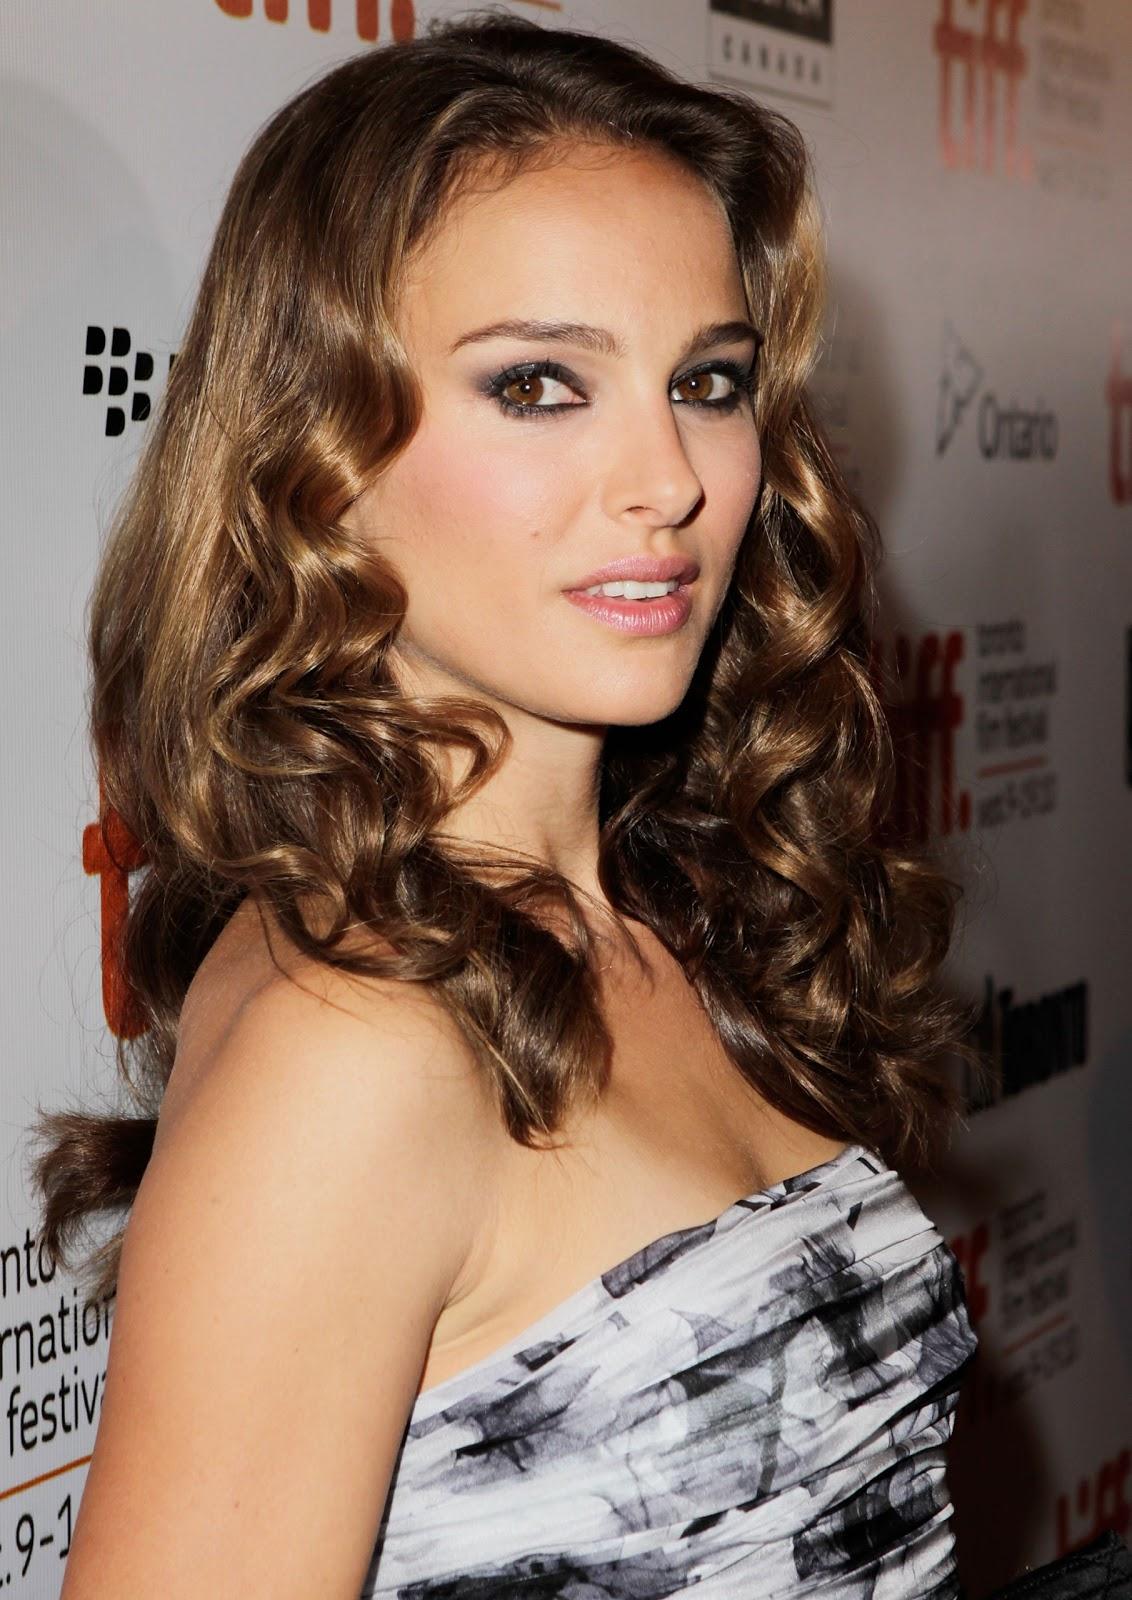 Natalie Portman Pictures Gallery 14 Film Actresses